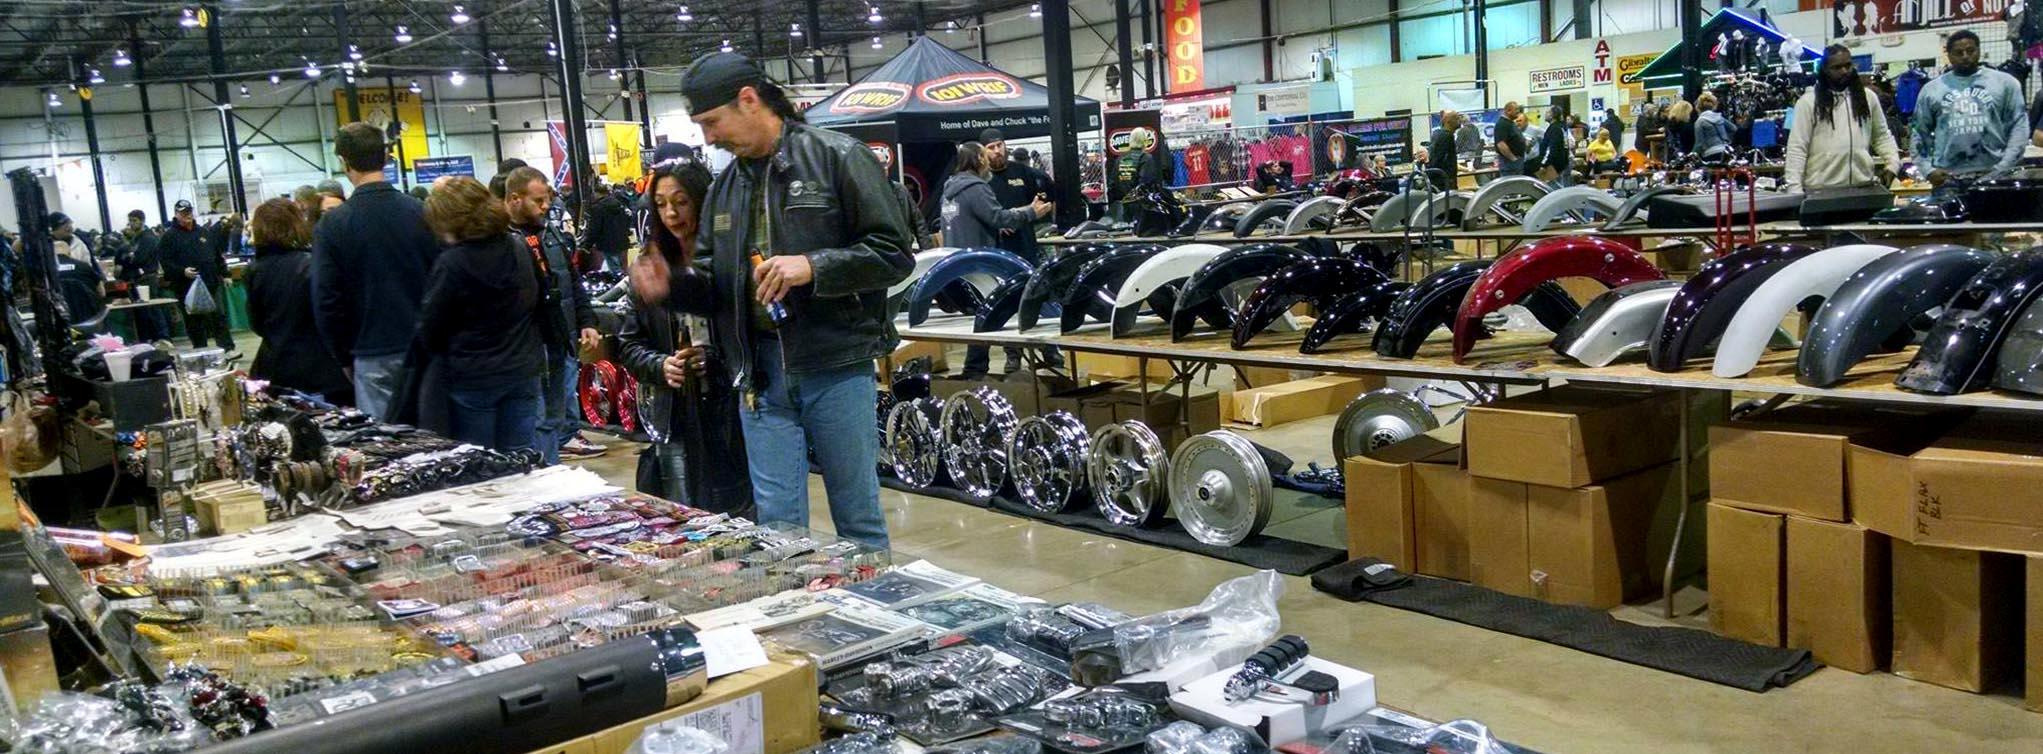 Giant Motorcycle Swap Meet Classicar News